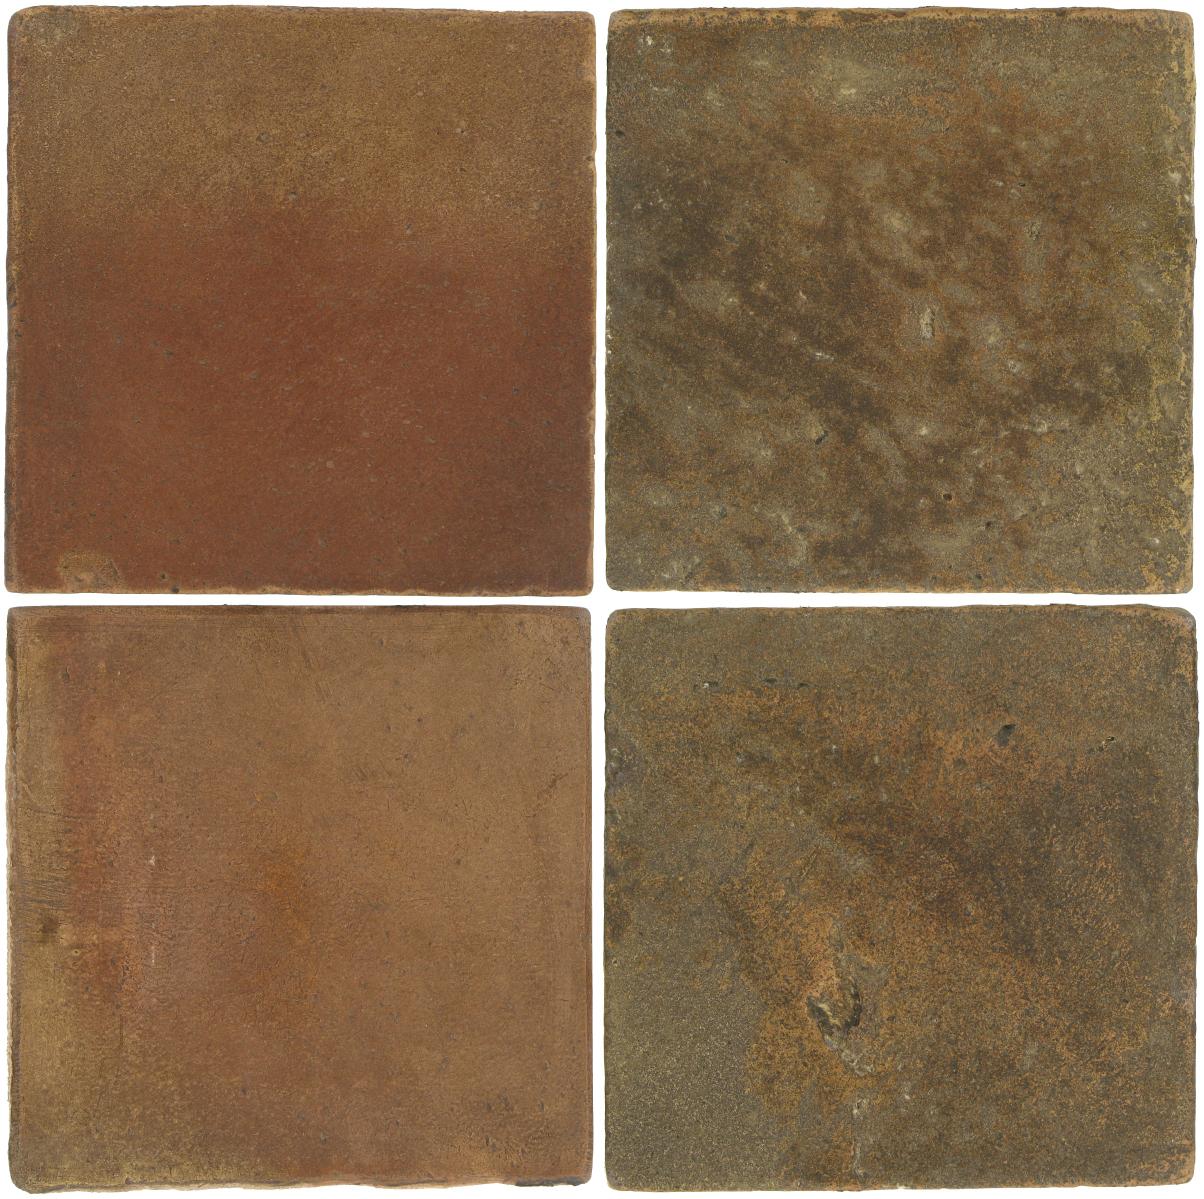 Pedralbes Antique Terracotta  2 Color Combinations  OHS-PSCM Camel Brown + VTG-PSVN Verona Brown